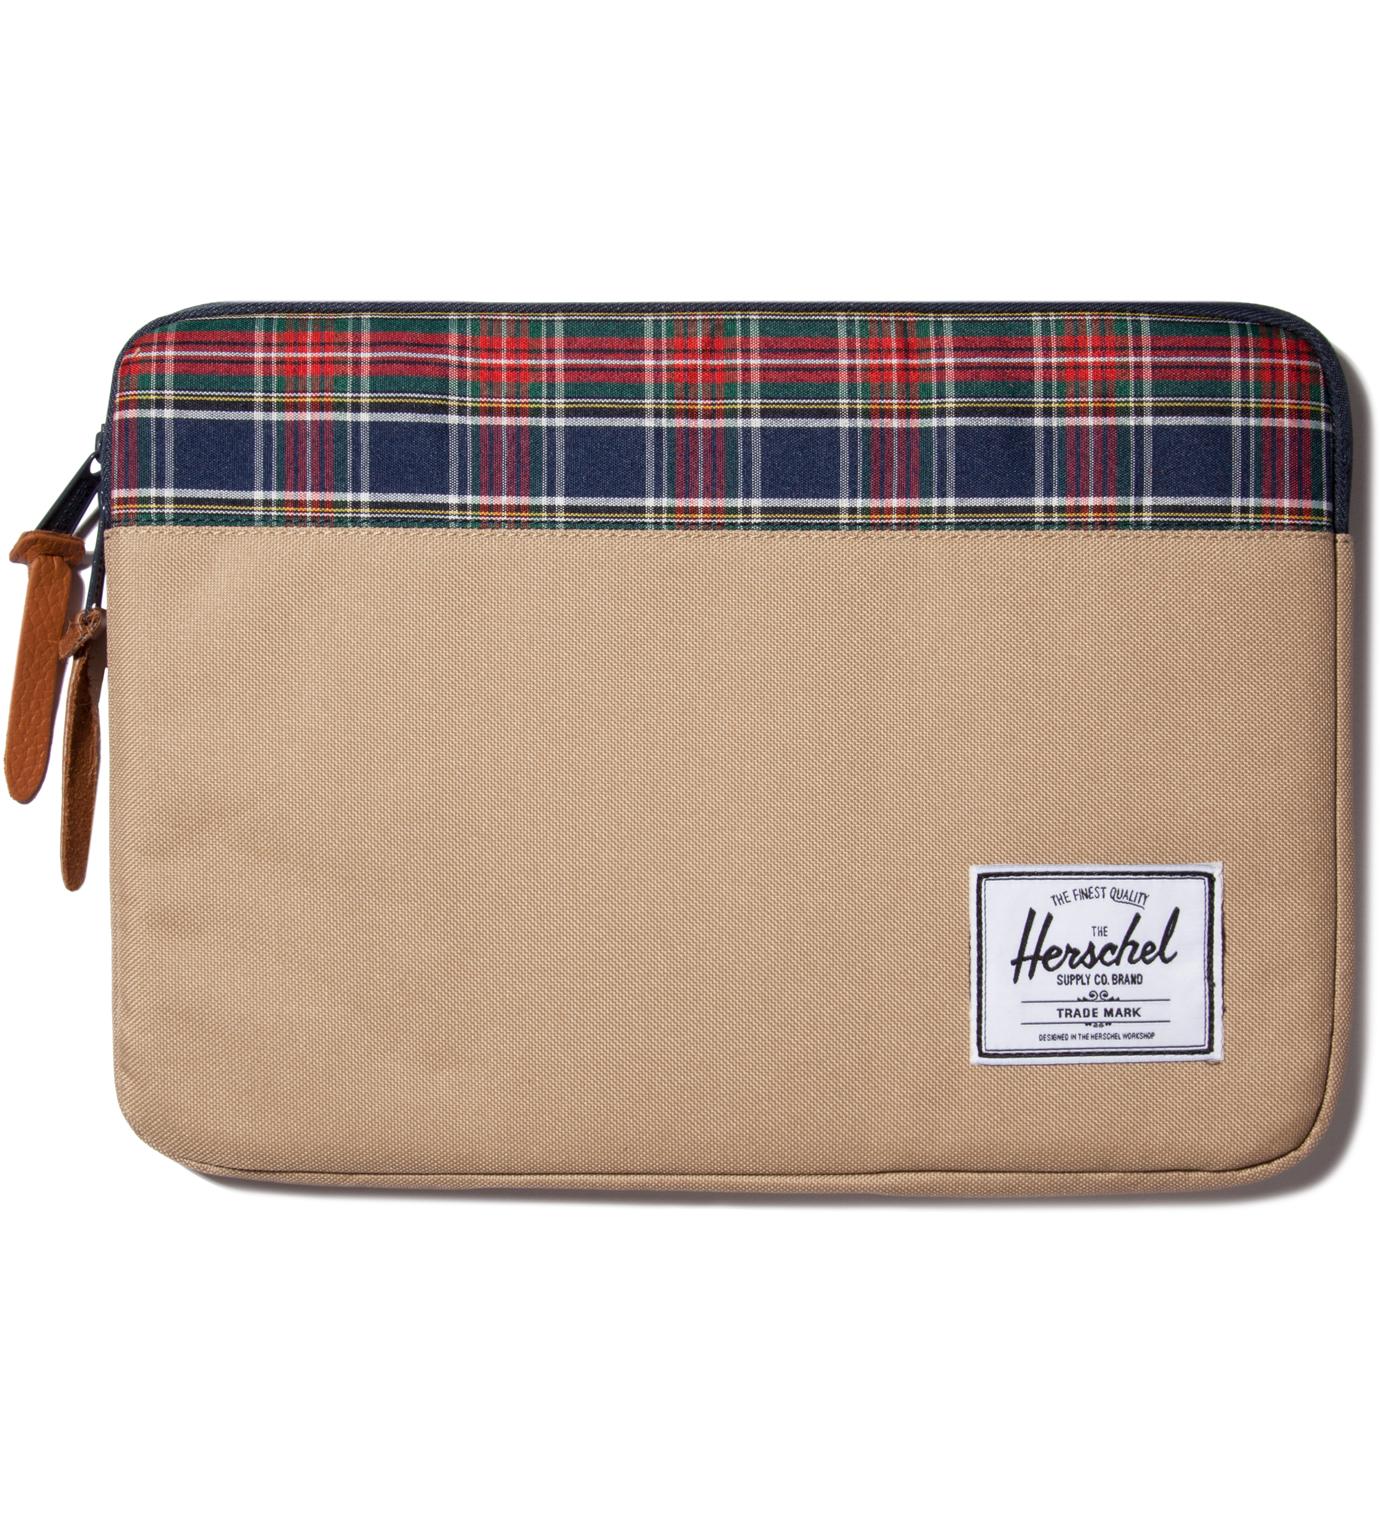 "Herschel Supply Co. Khaki Anchor 13"" Macbook Sleeve"